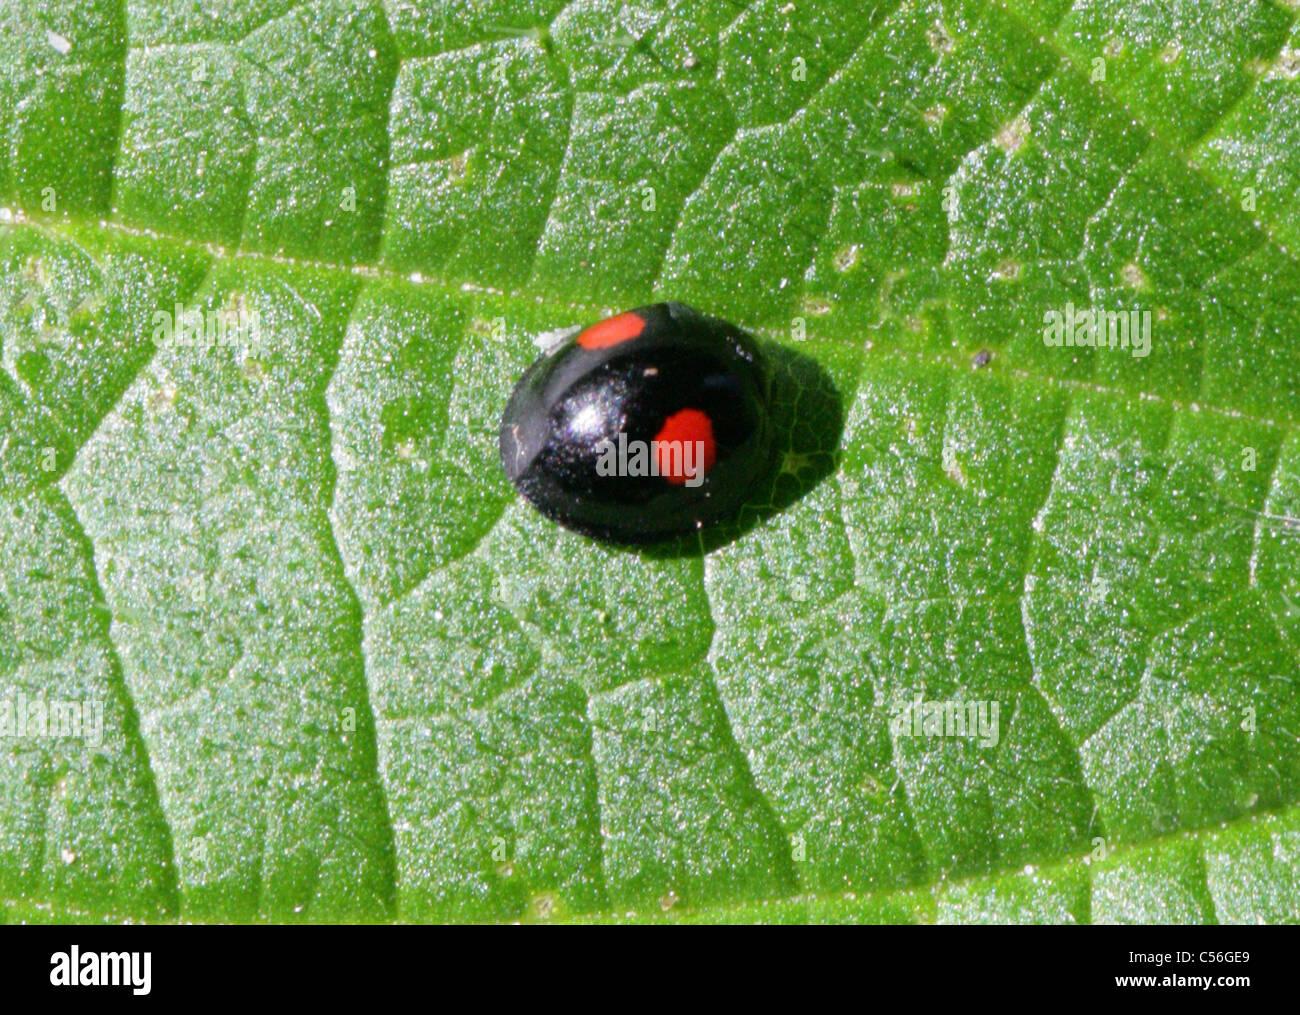 Two-spotted Ladybird or Lady Beetle, Adalia bipunctata syn Macrosiphum rosae, Coccinellidae. - Stock Image